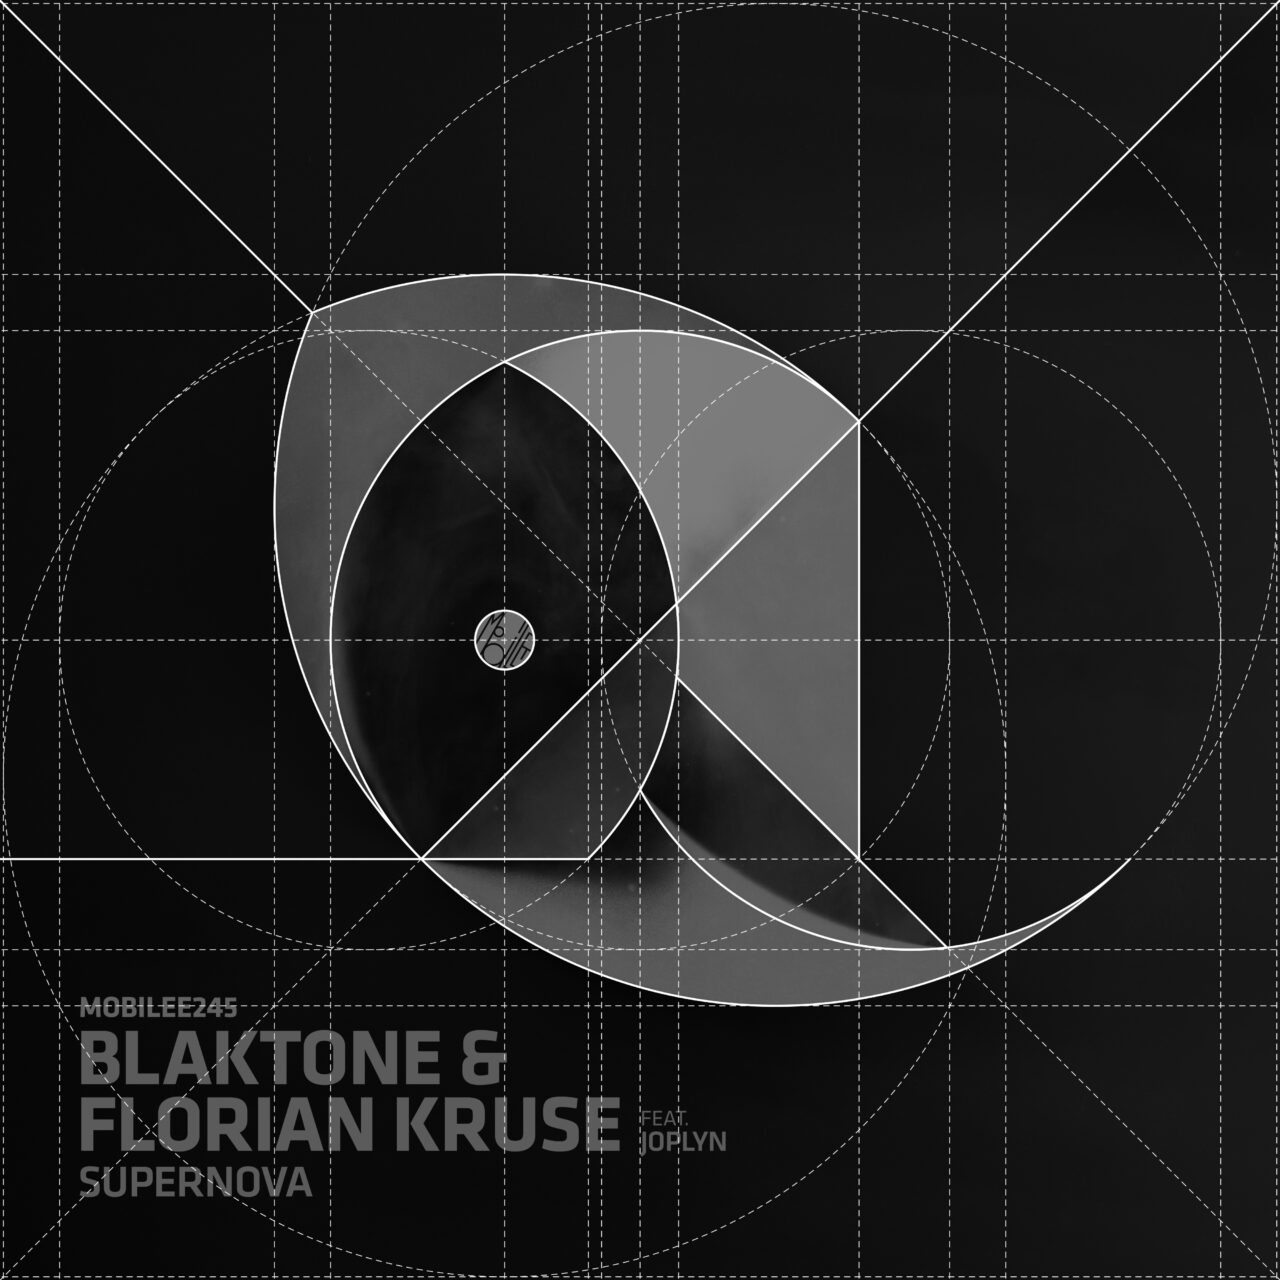 Mobilee245_Blaktone&FlorianKruse_Supernova_construction_DEF